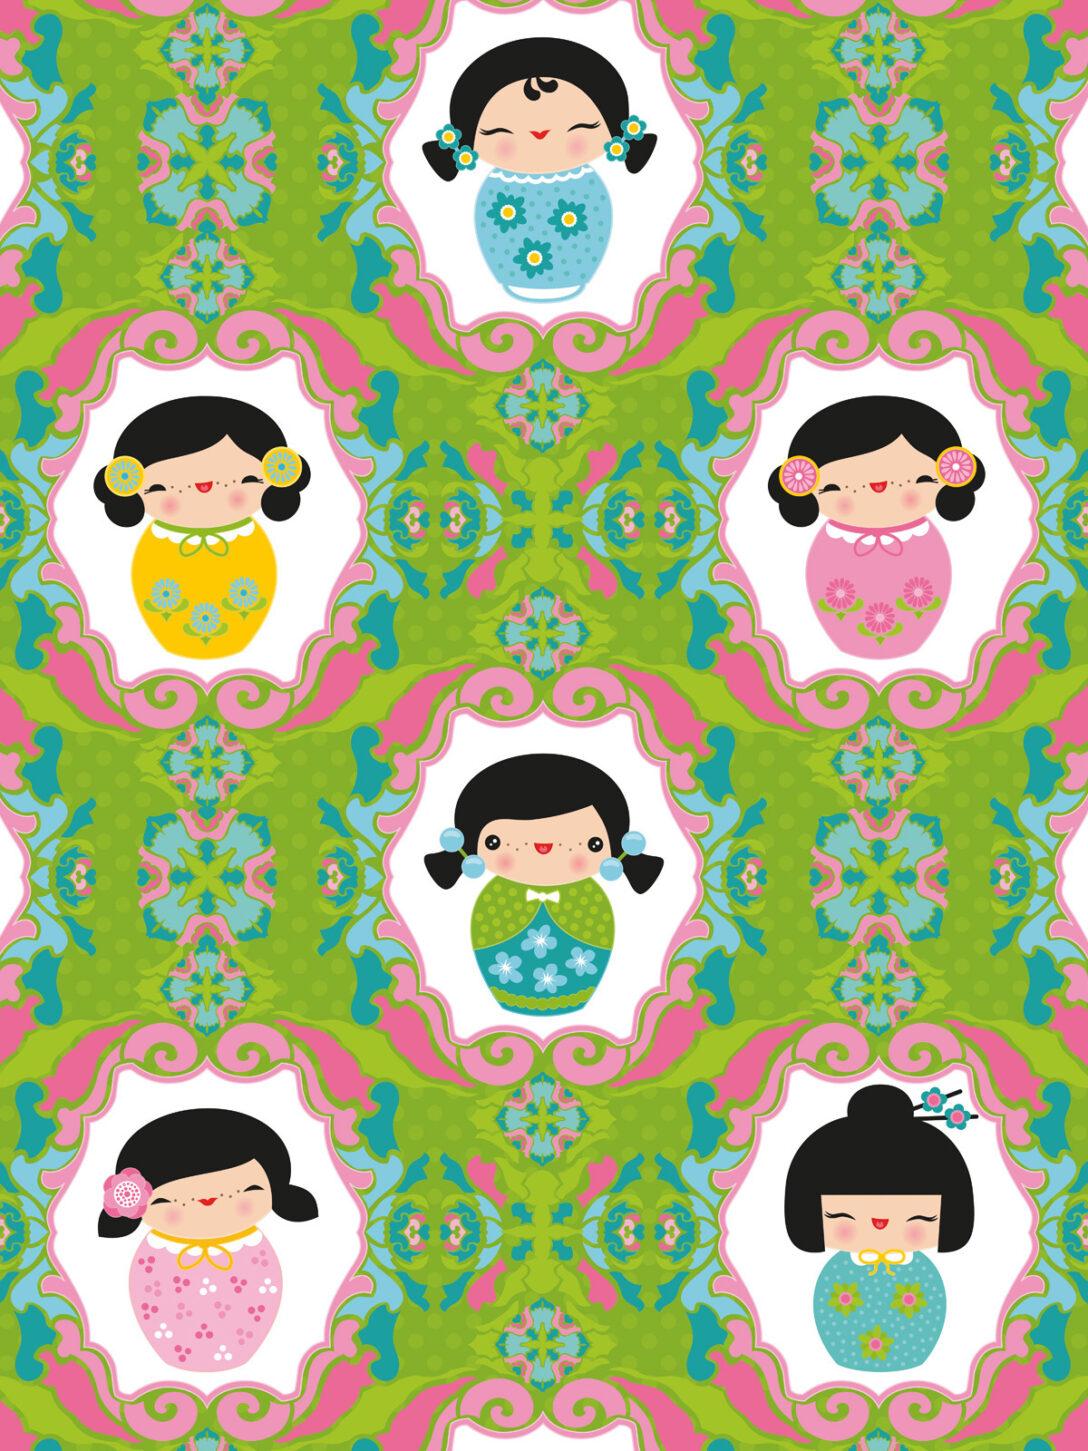 Large Size of Wandbild Kinderzimmer Tapeten Kokeshi Dolls Grn Miyo Mori Regal Wohnzimmer Regale Sofa Weiß Wandbilder Schlafzimmer Kinderzimmer Wandbild Kinderzimmer